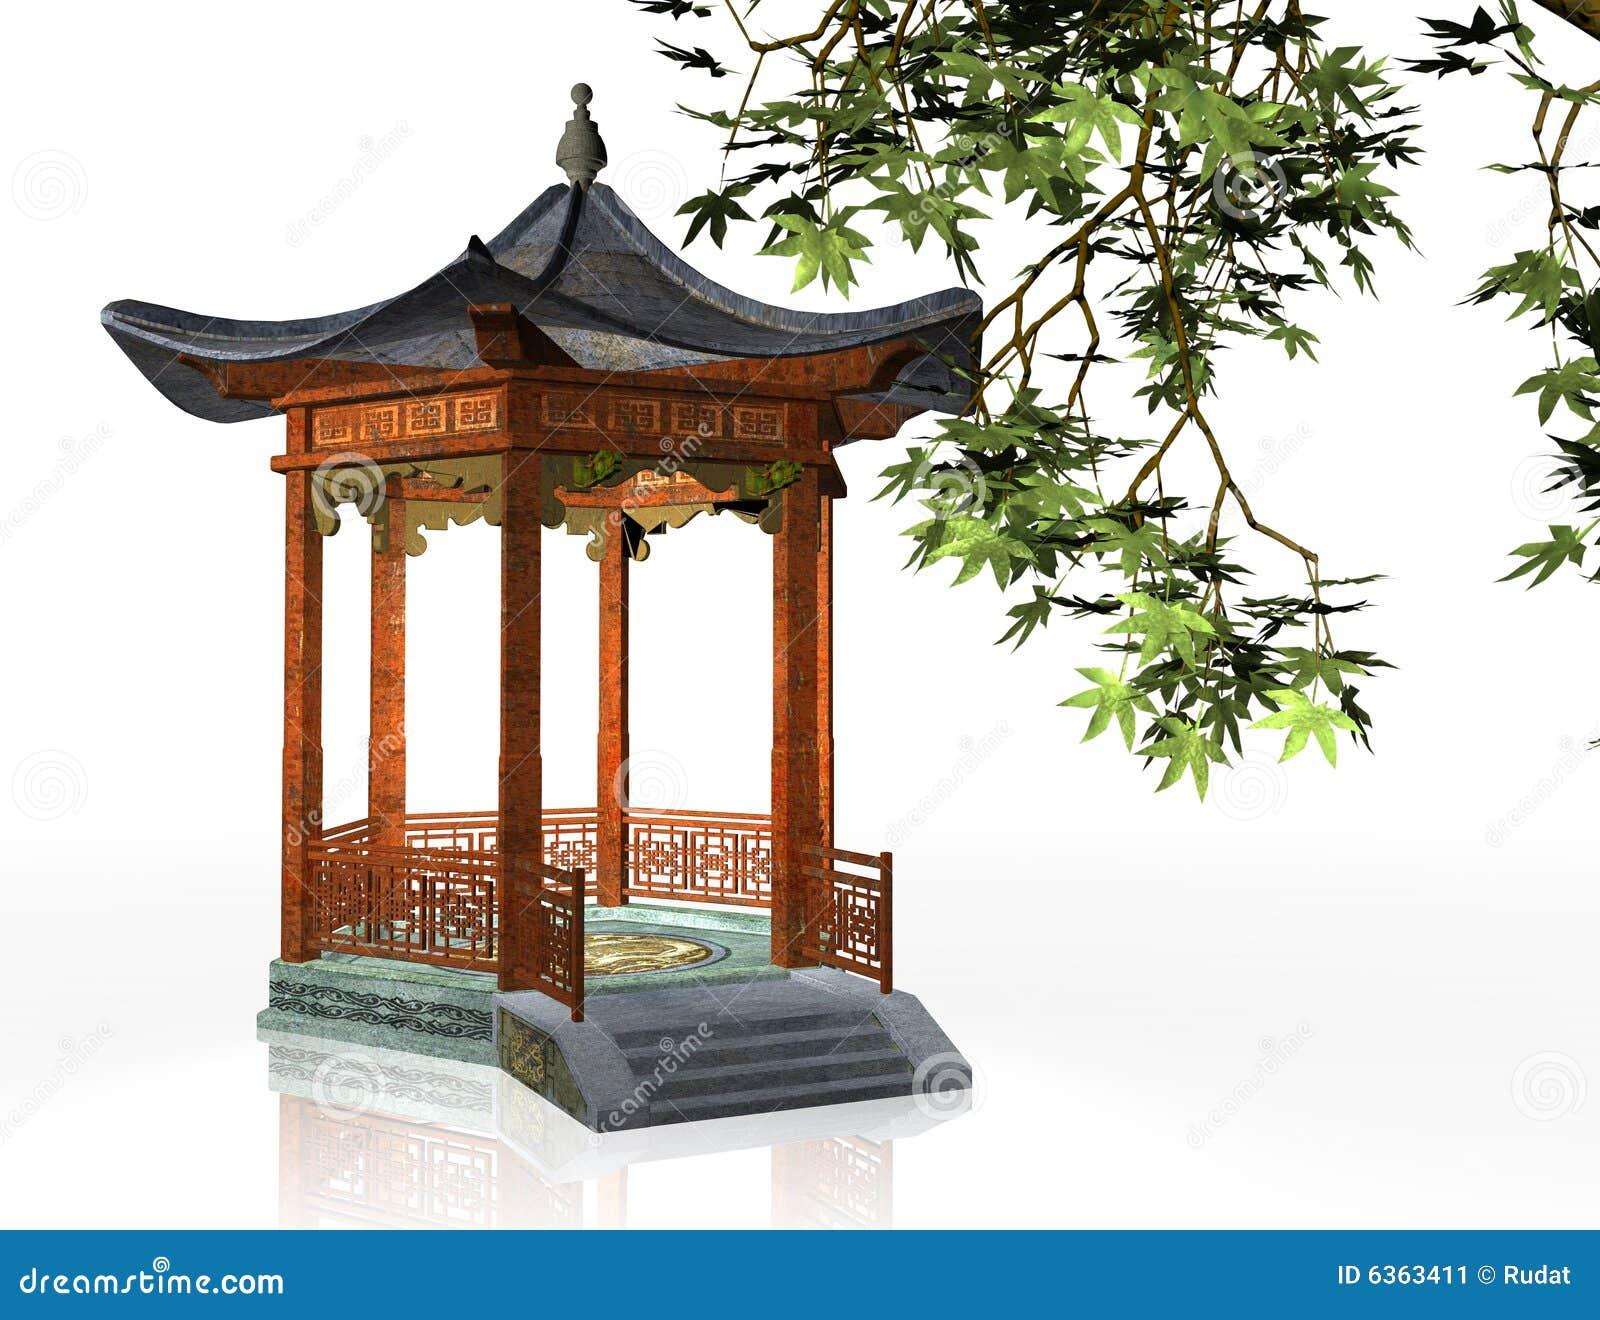 3d illustration of oriental pavilion on white background.